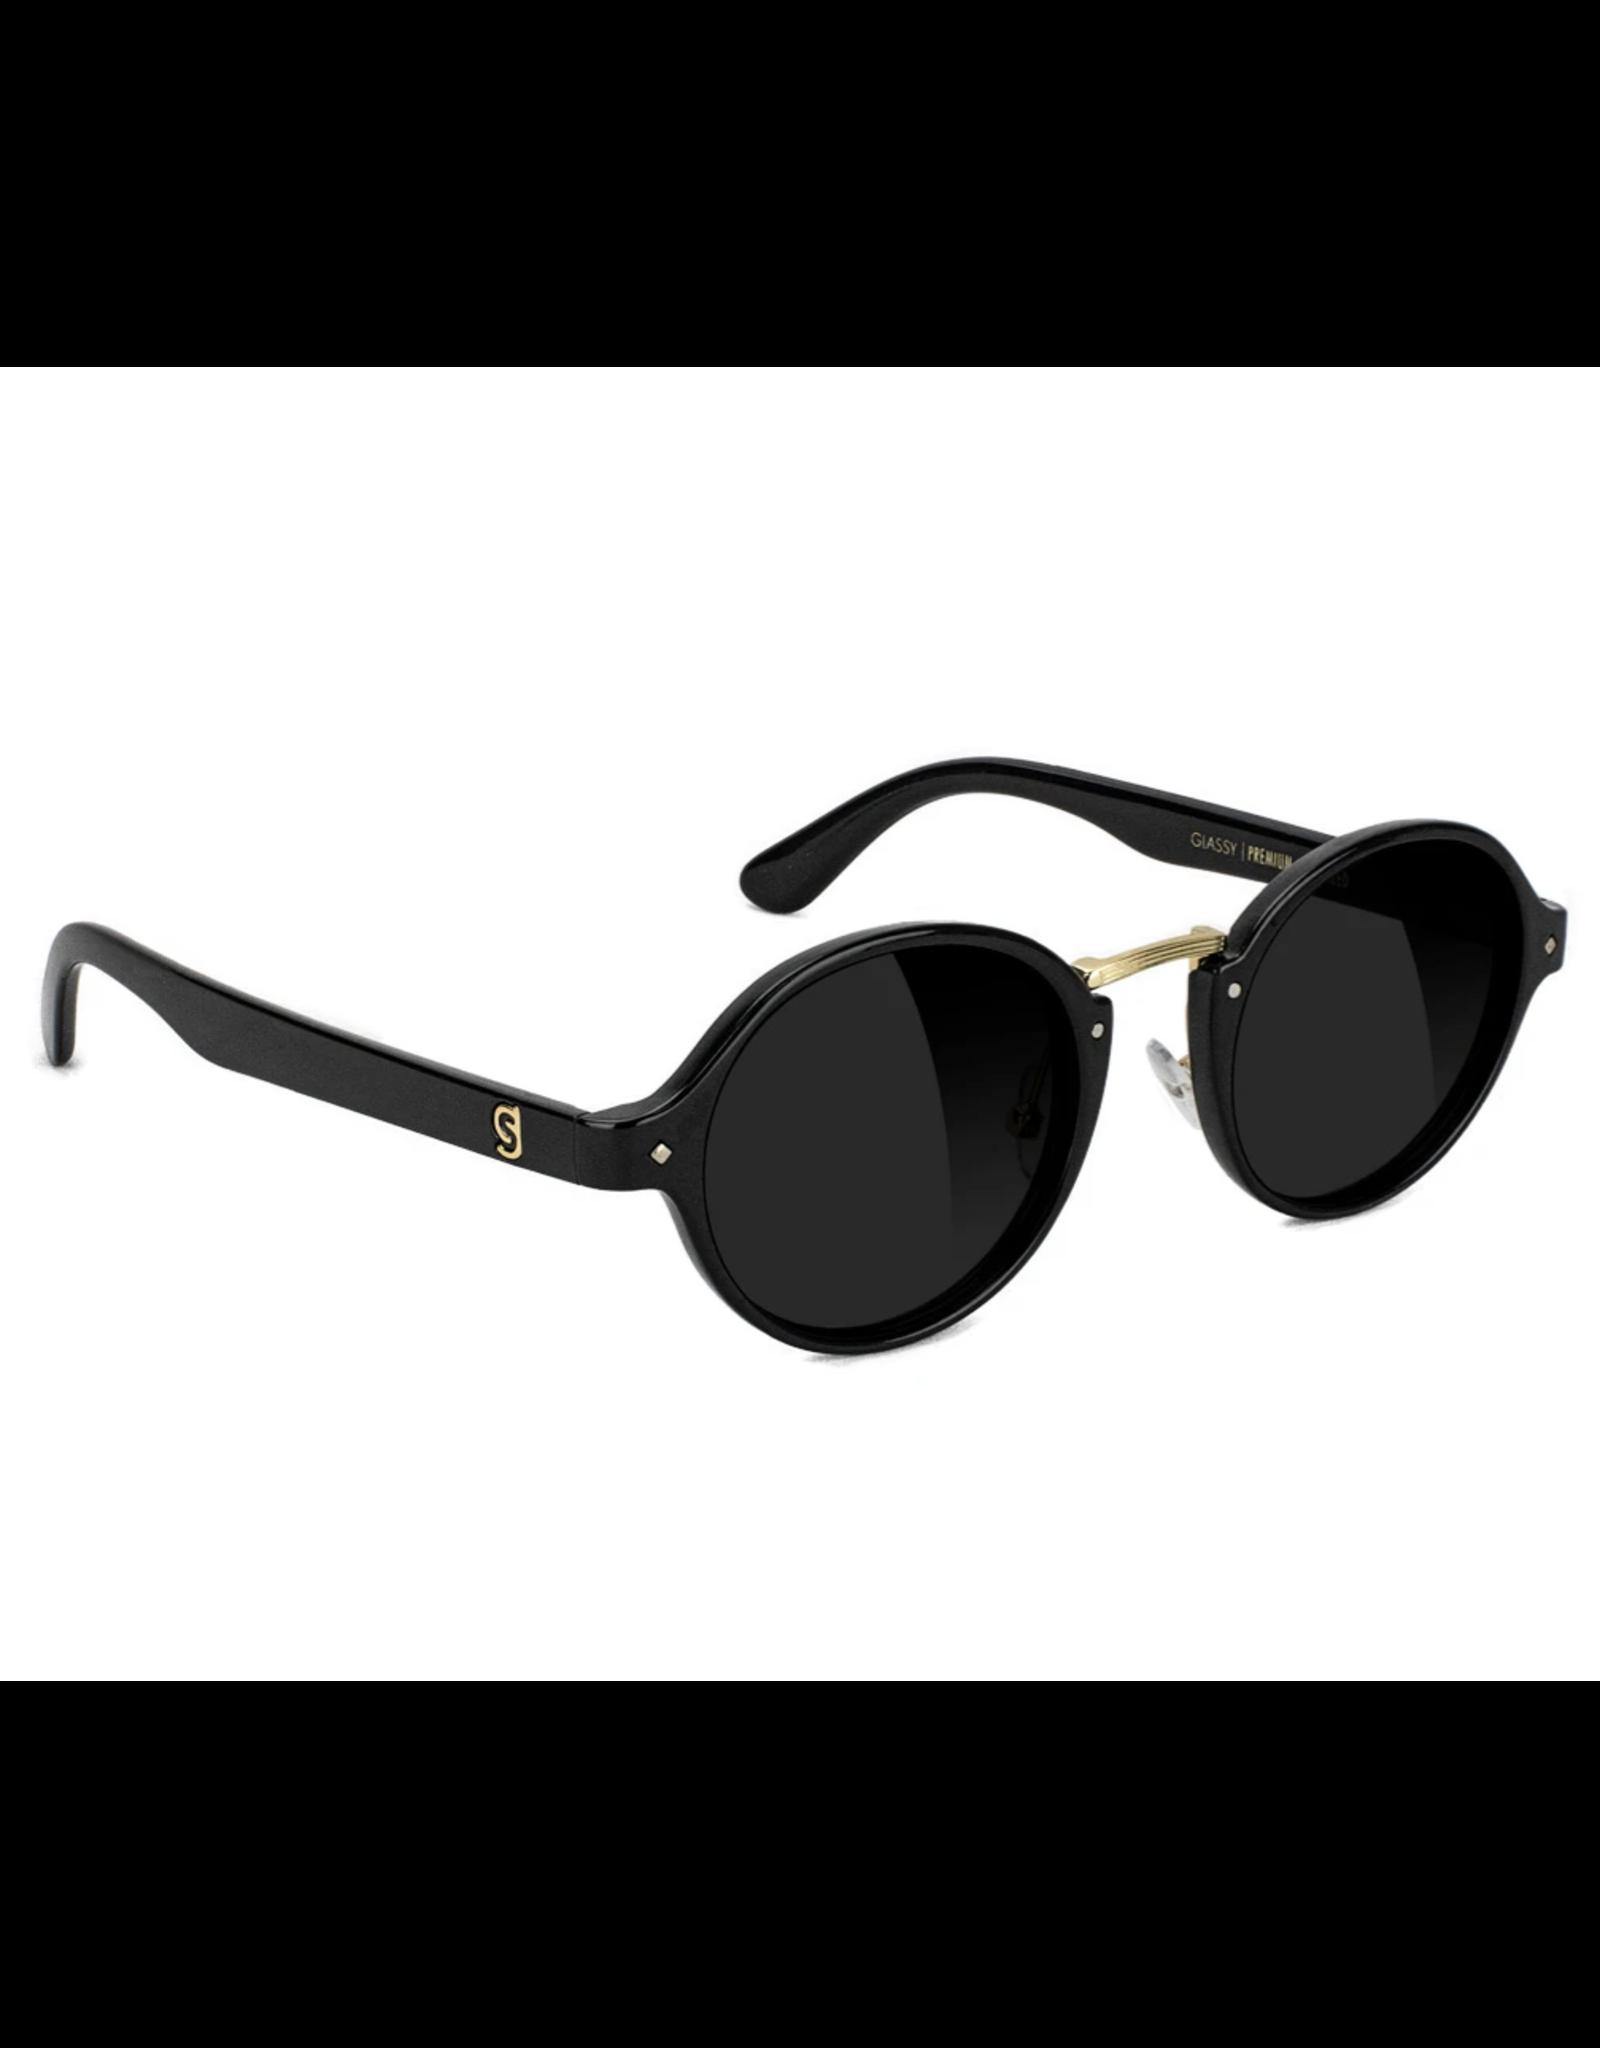 Glassy Prod Premium Polarized Shades - Black/Gold